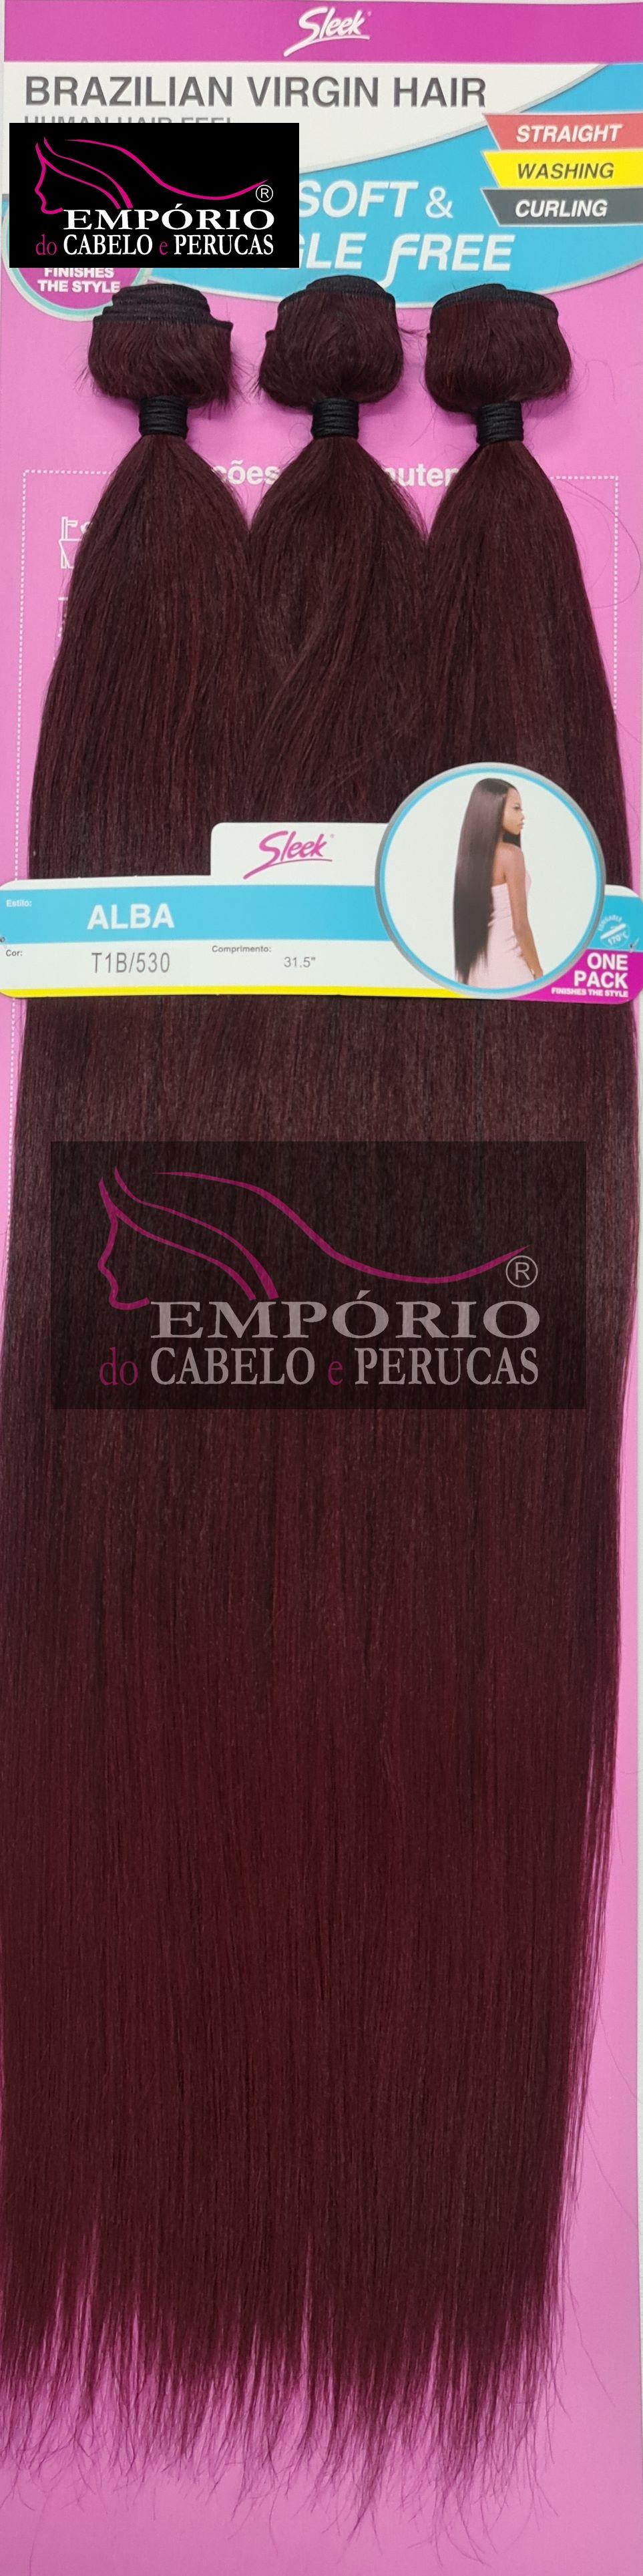 CABELO BIO FIBRA SLEEK BRAZILIAN VIRGIN HAIR ALBA